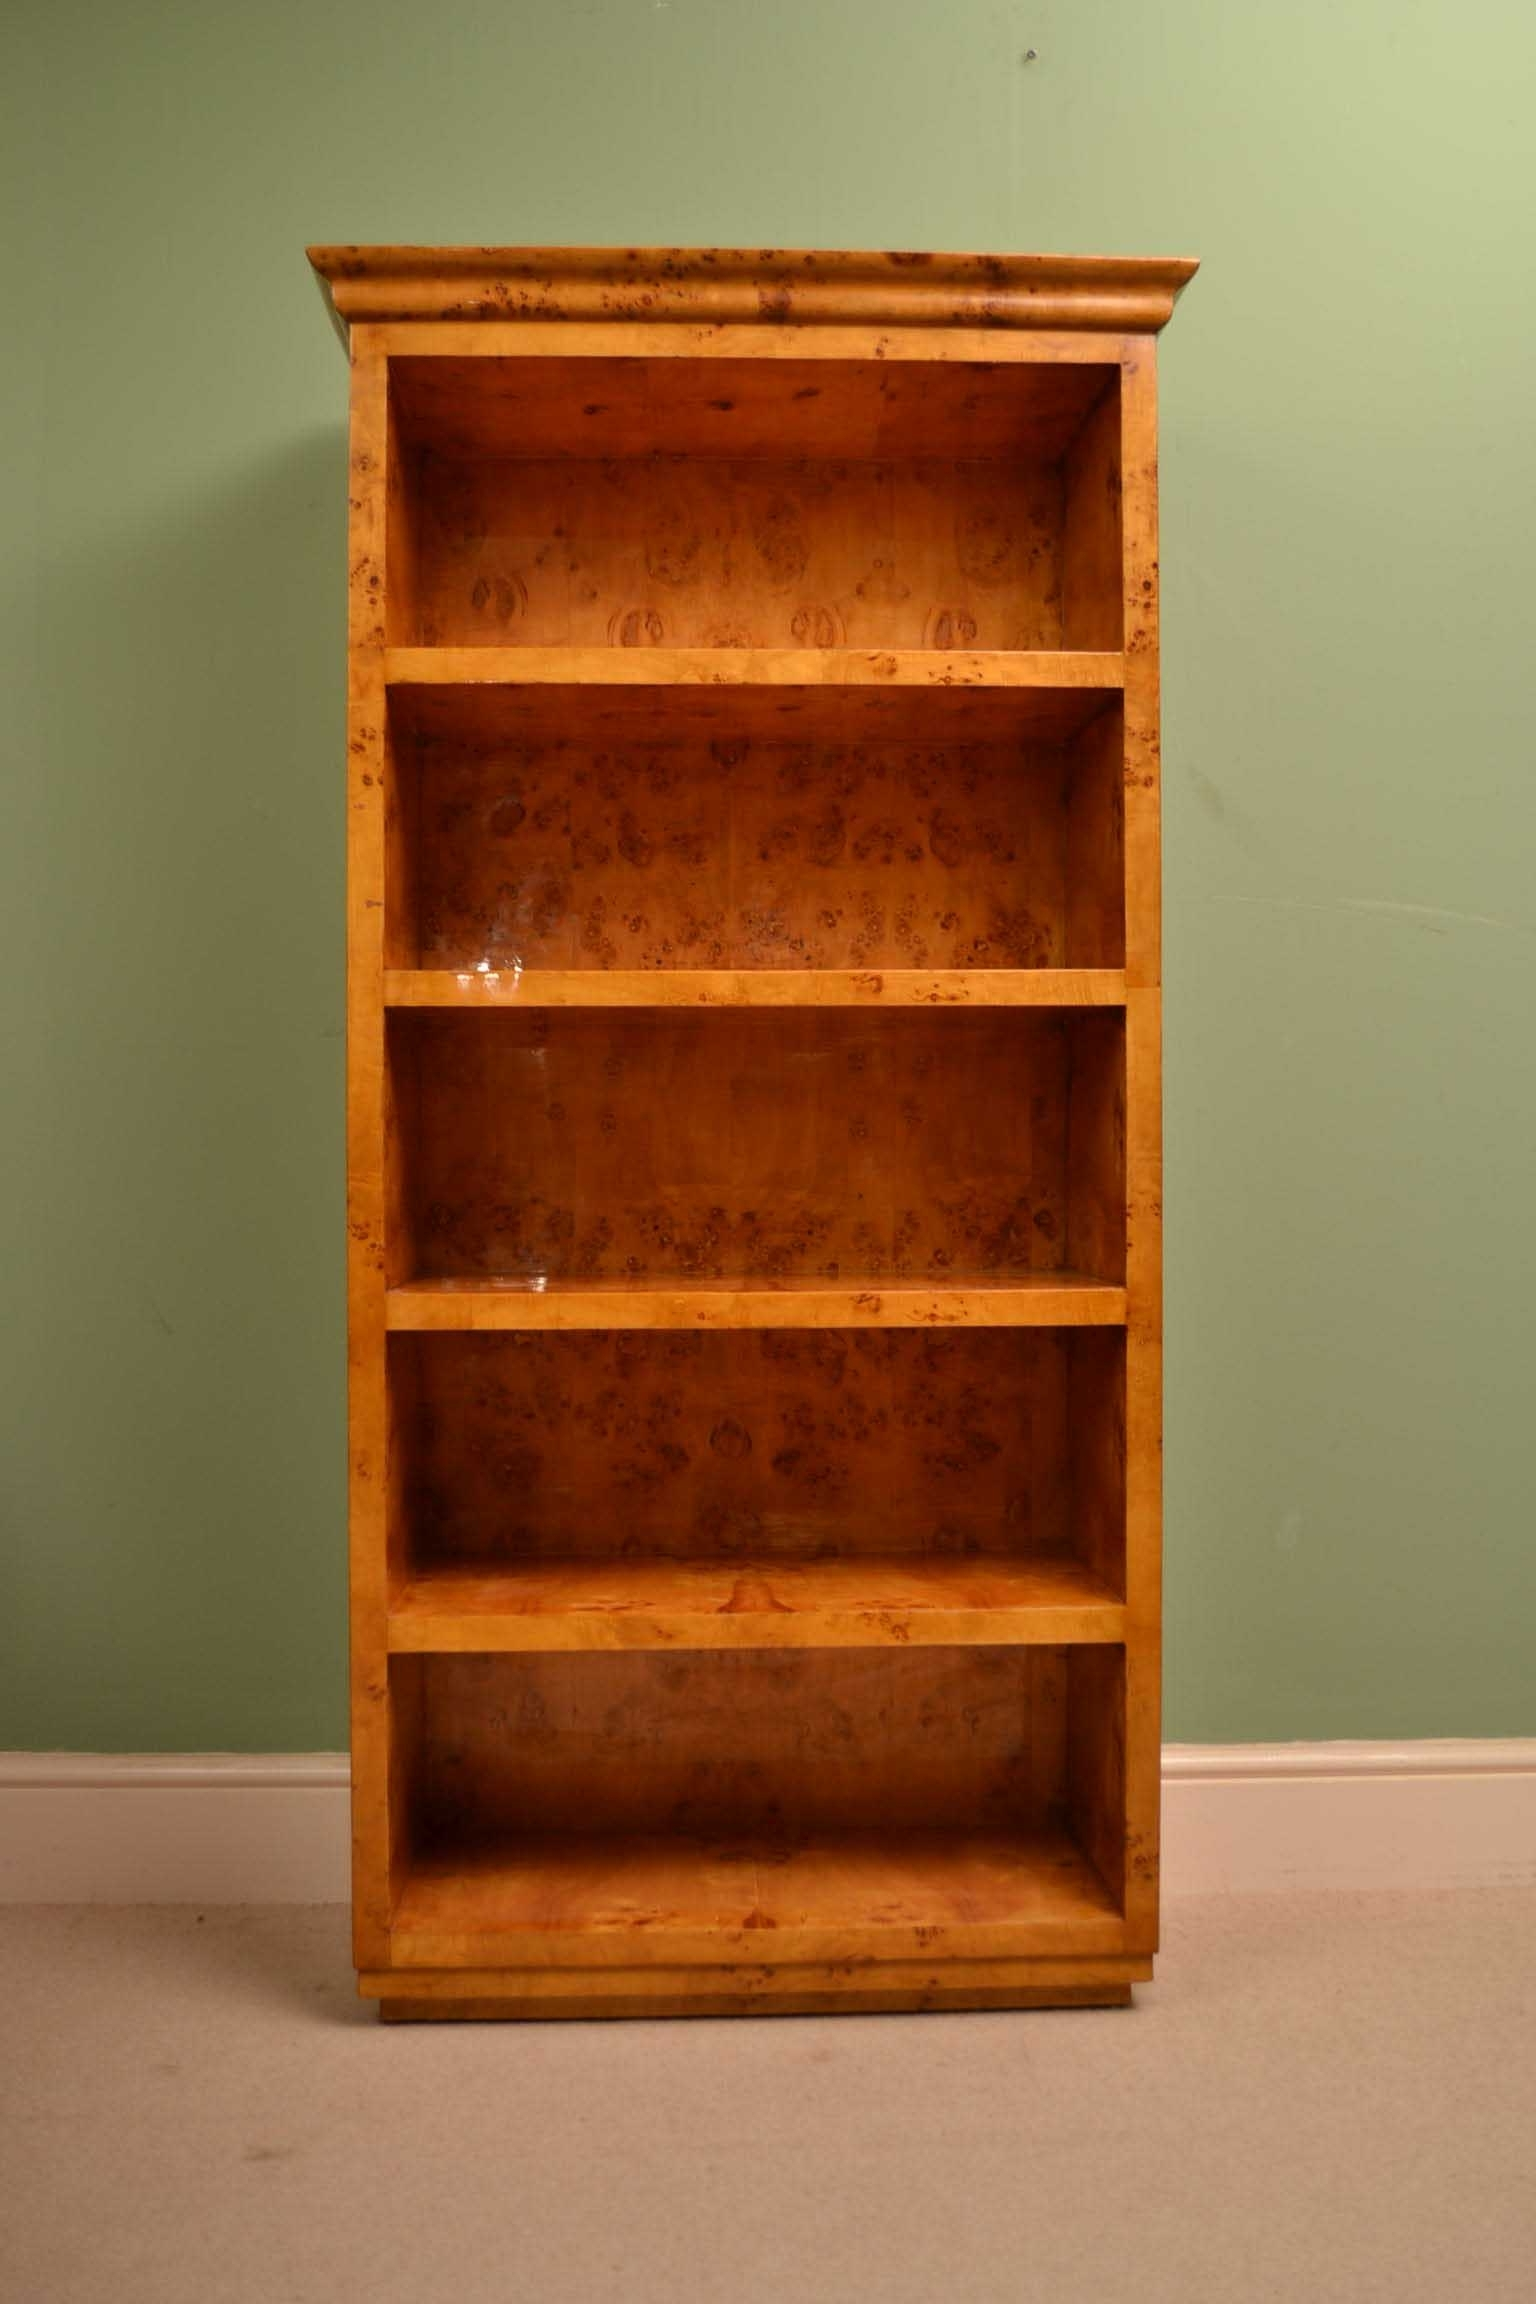 brushed com at shop pd sauder h lowes maple bookcase